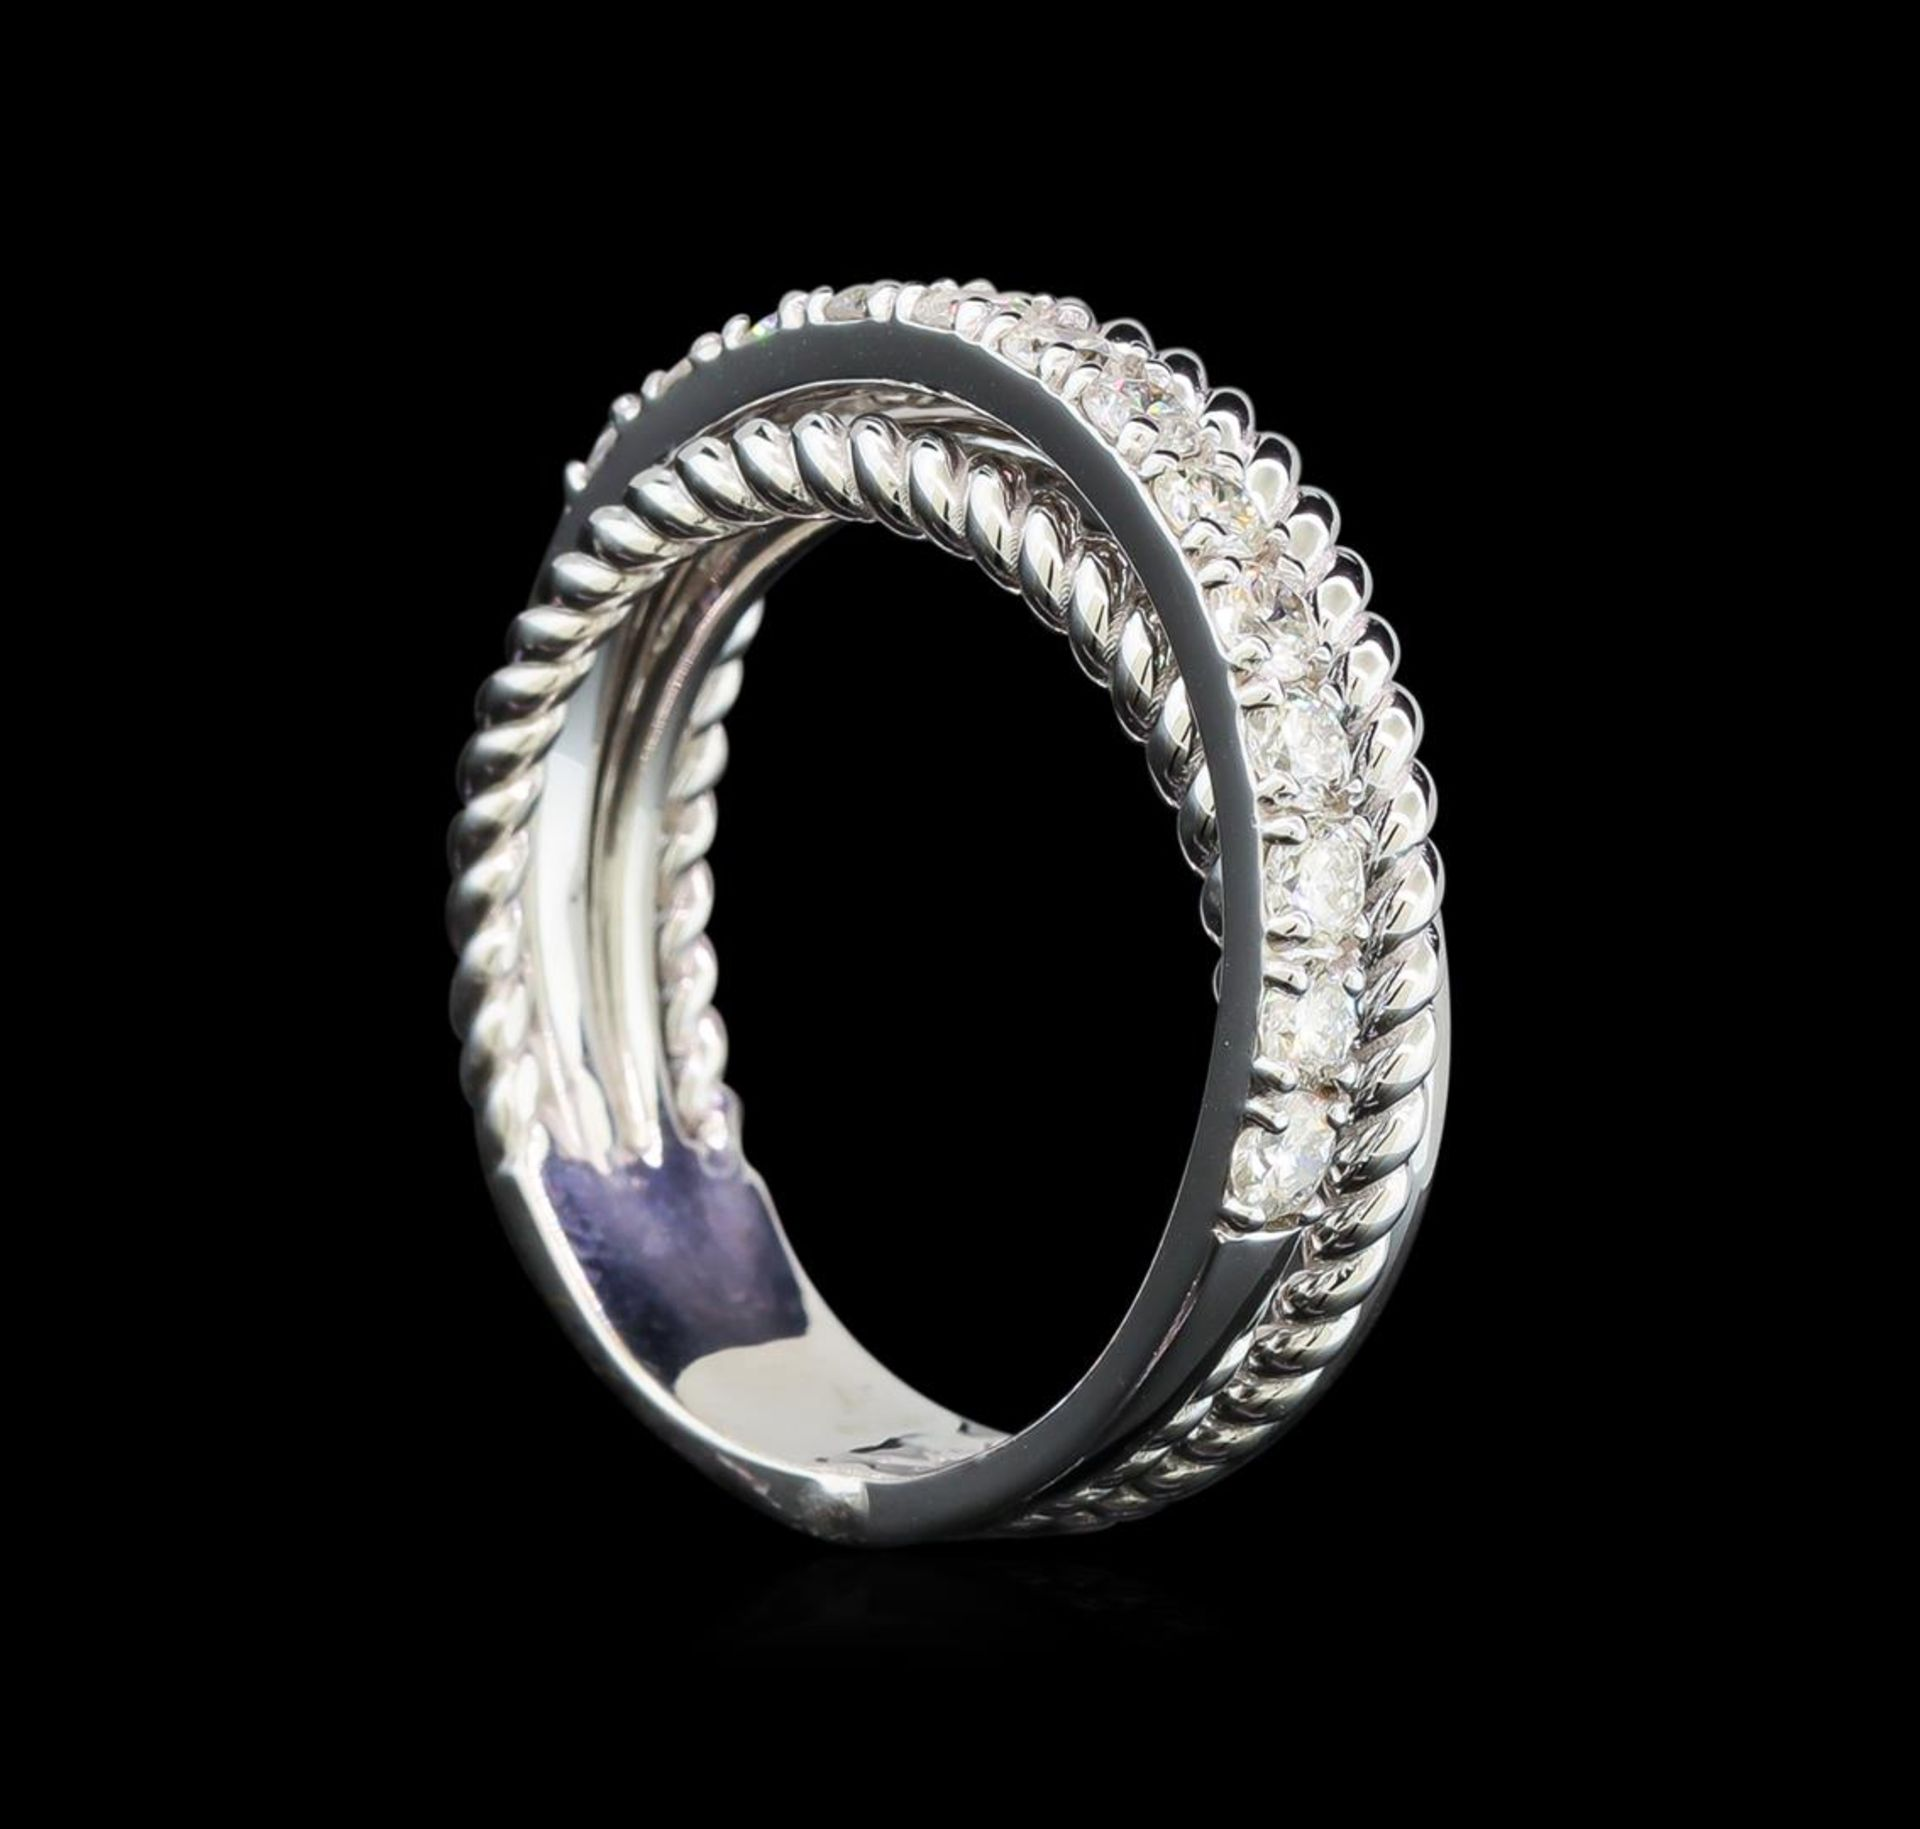 0.65 ctw Diamond Ring - 14KT White Gold - Image 3 of 3